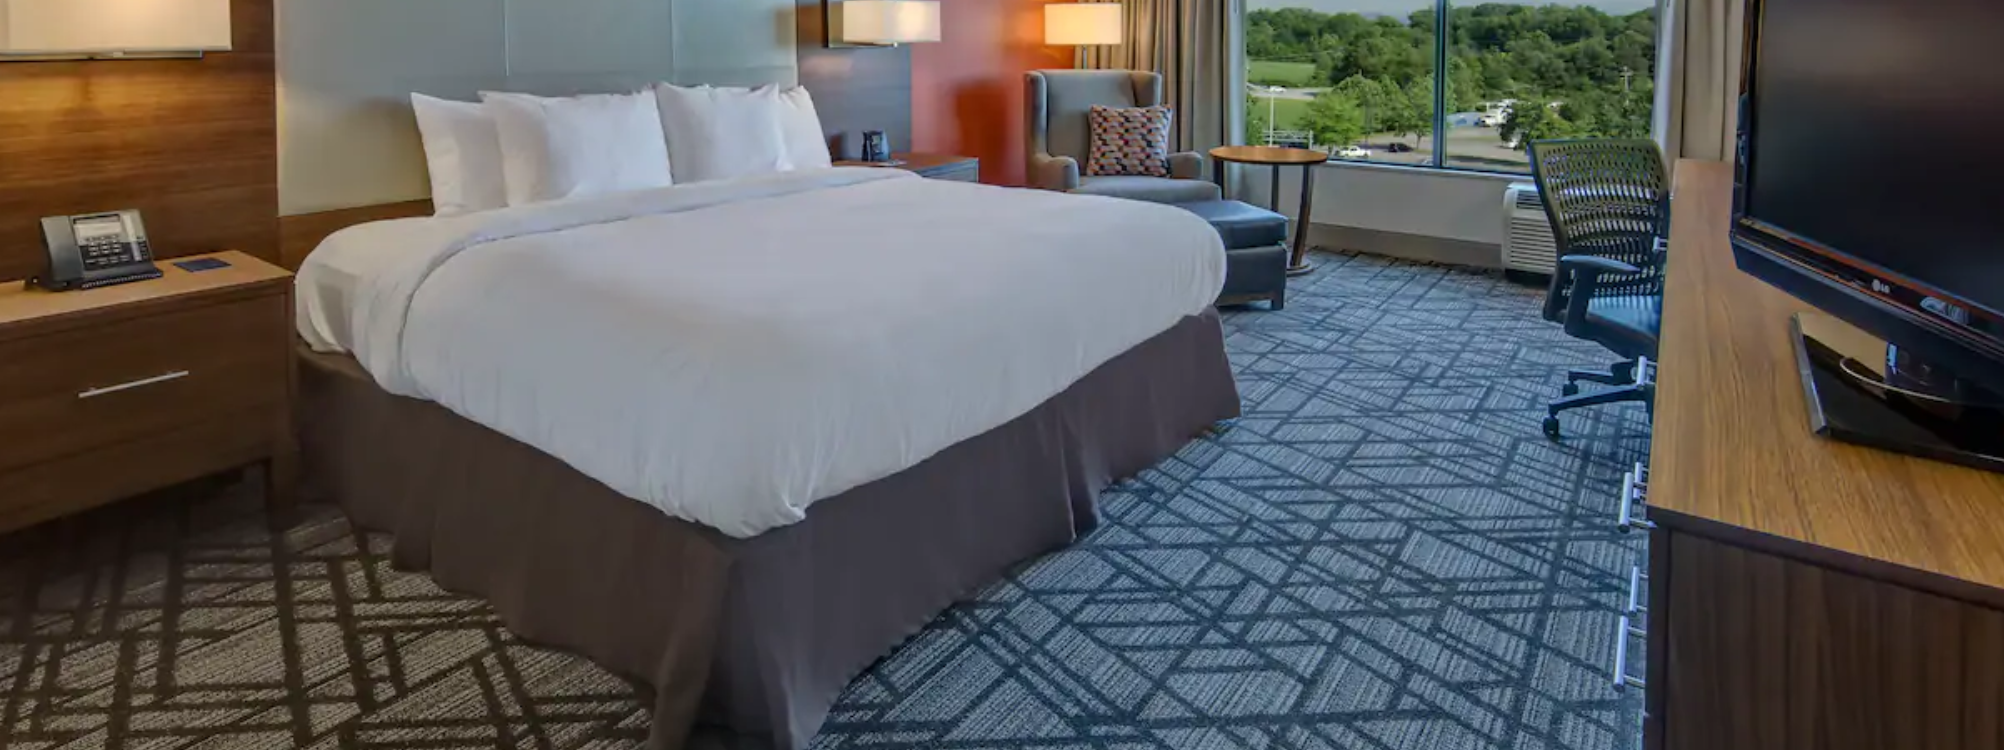 https://www.hotelsbyday.com/_data/default-hotel_image/3/19233/screenshot-2020-06-29-at-11-53-48-am.png